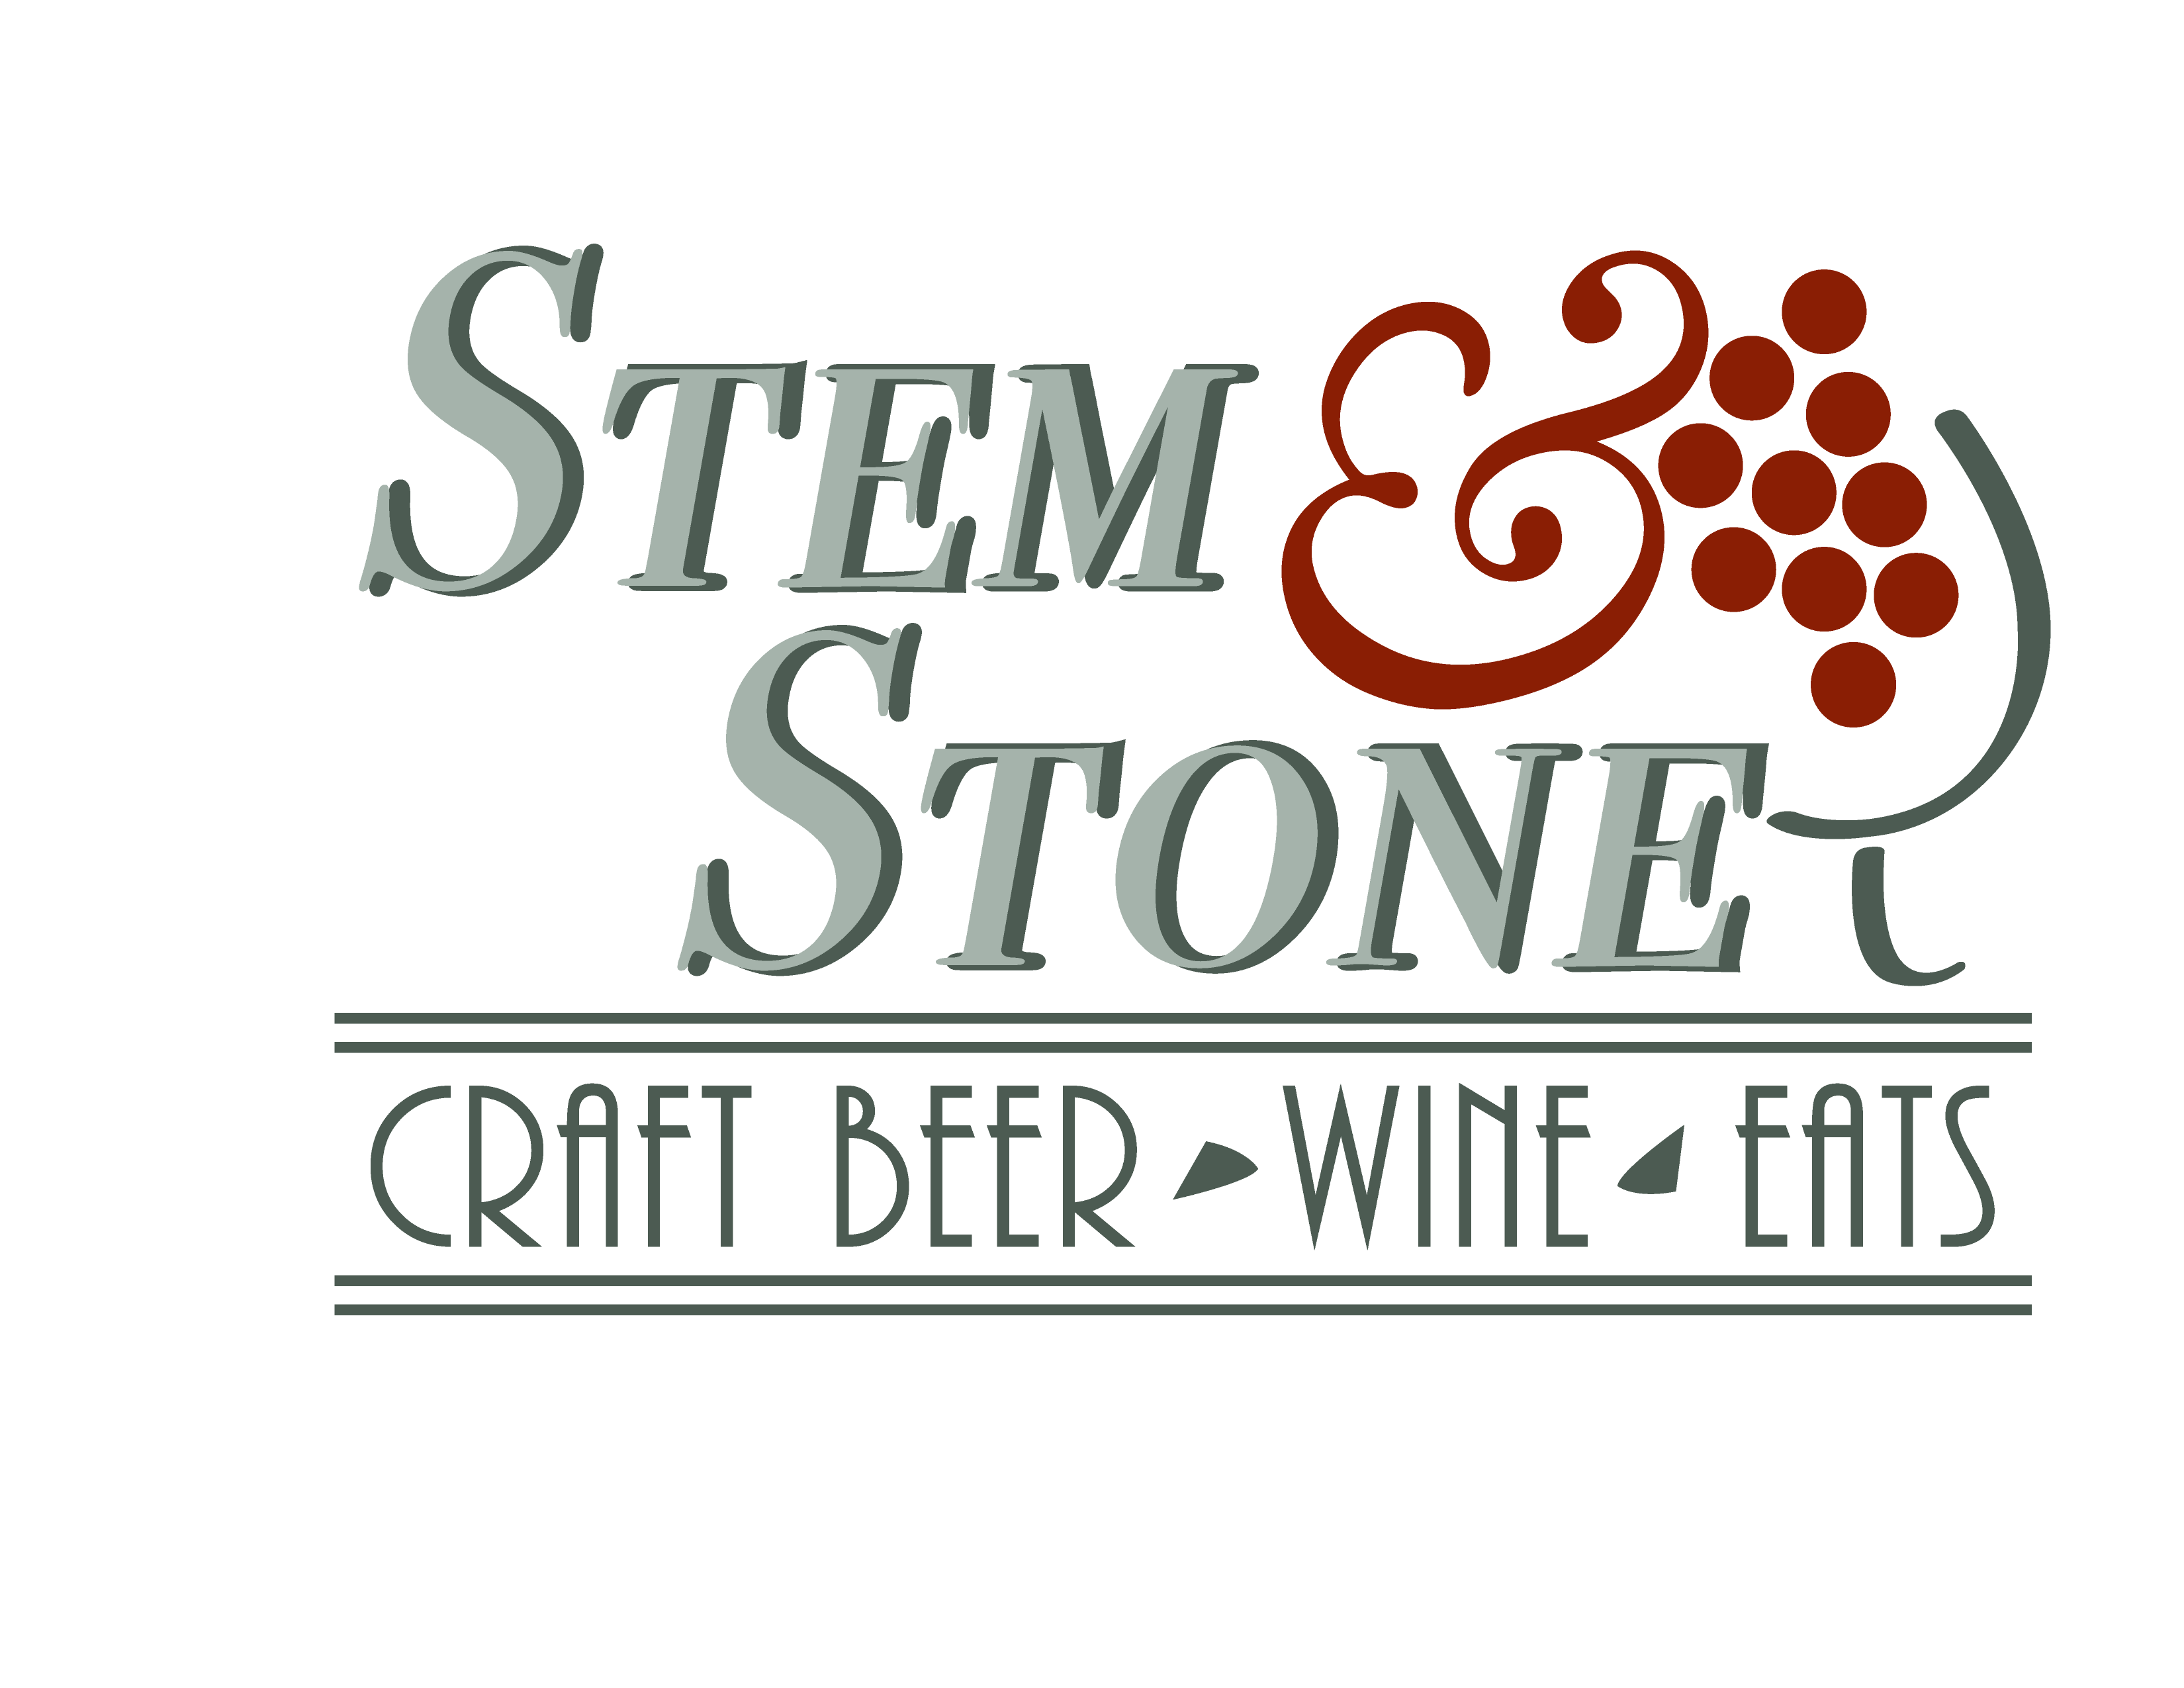 Stem & Stone